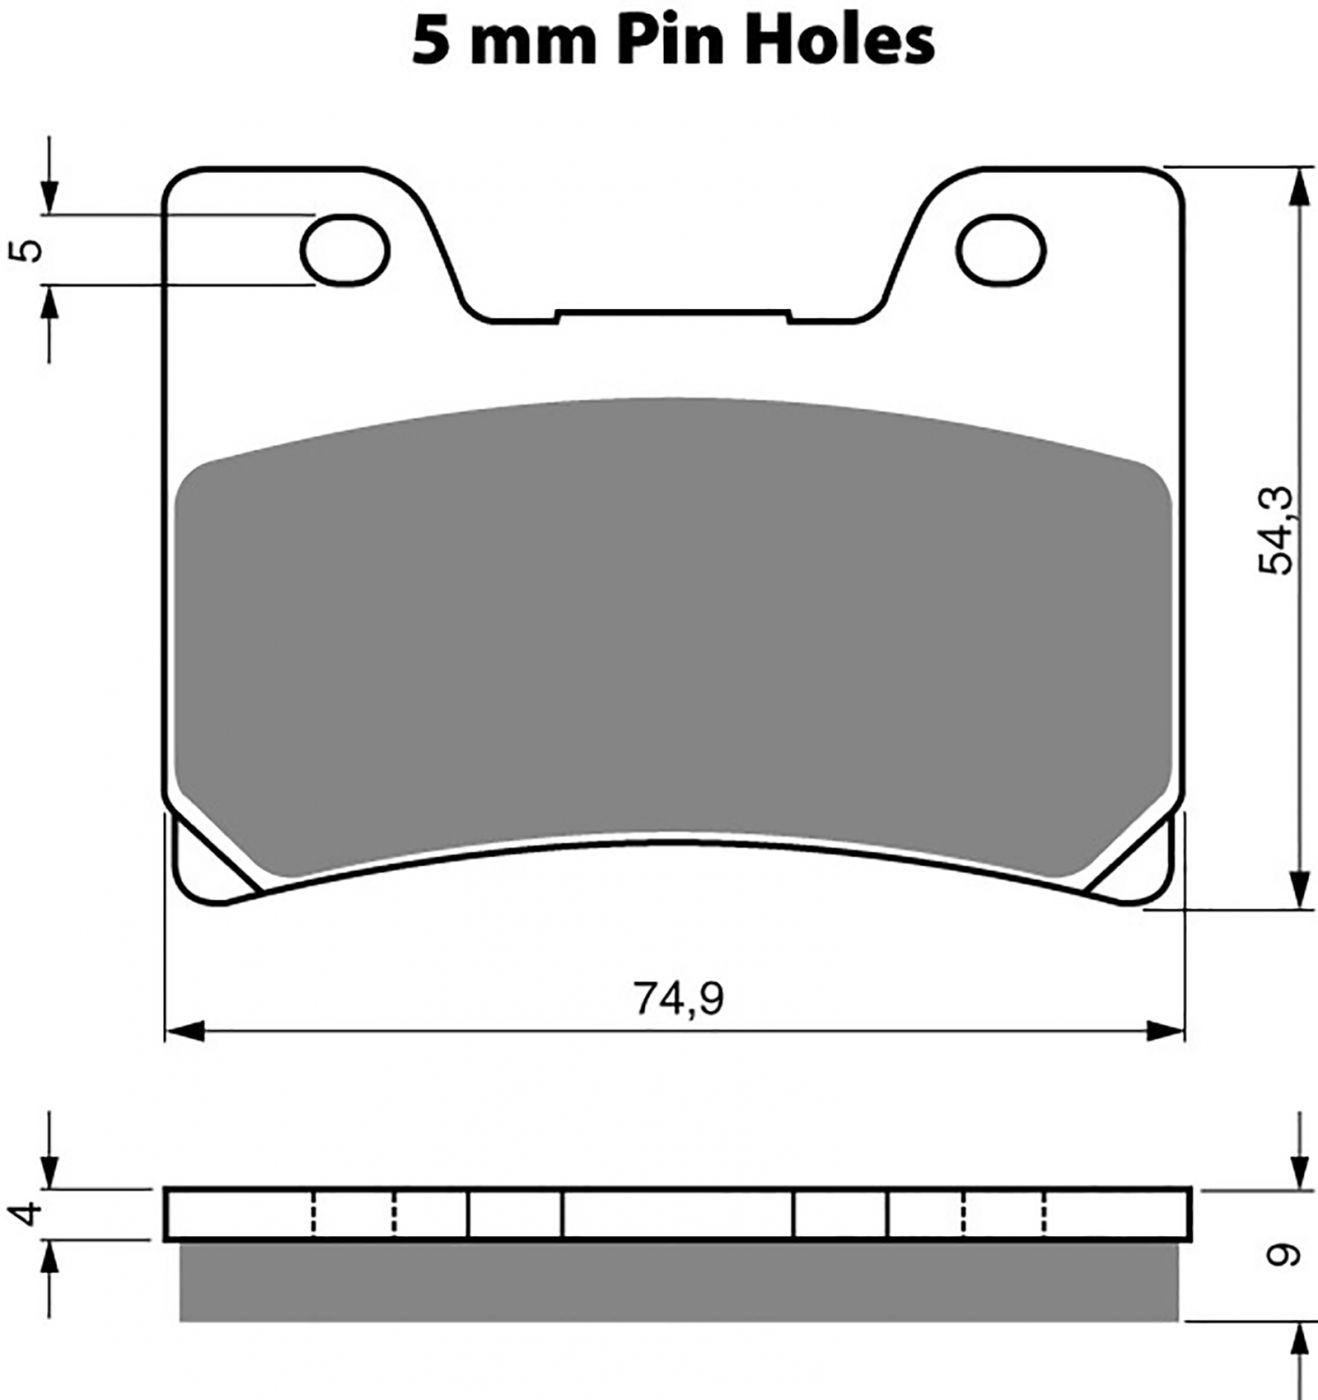 goldfren s33 brake pads - 700028GS image